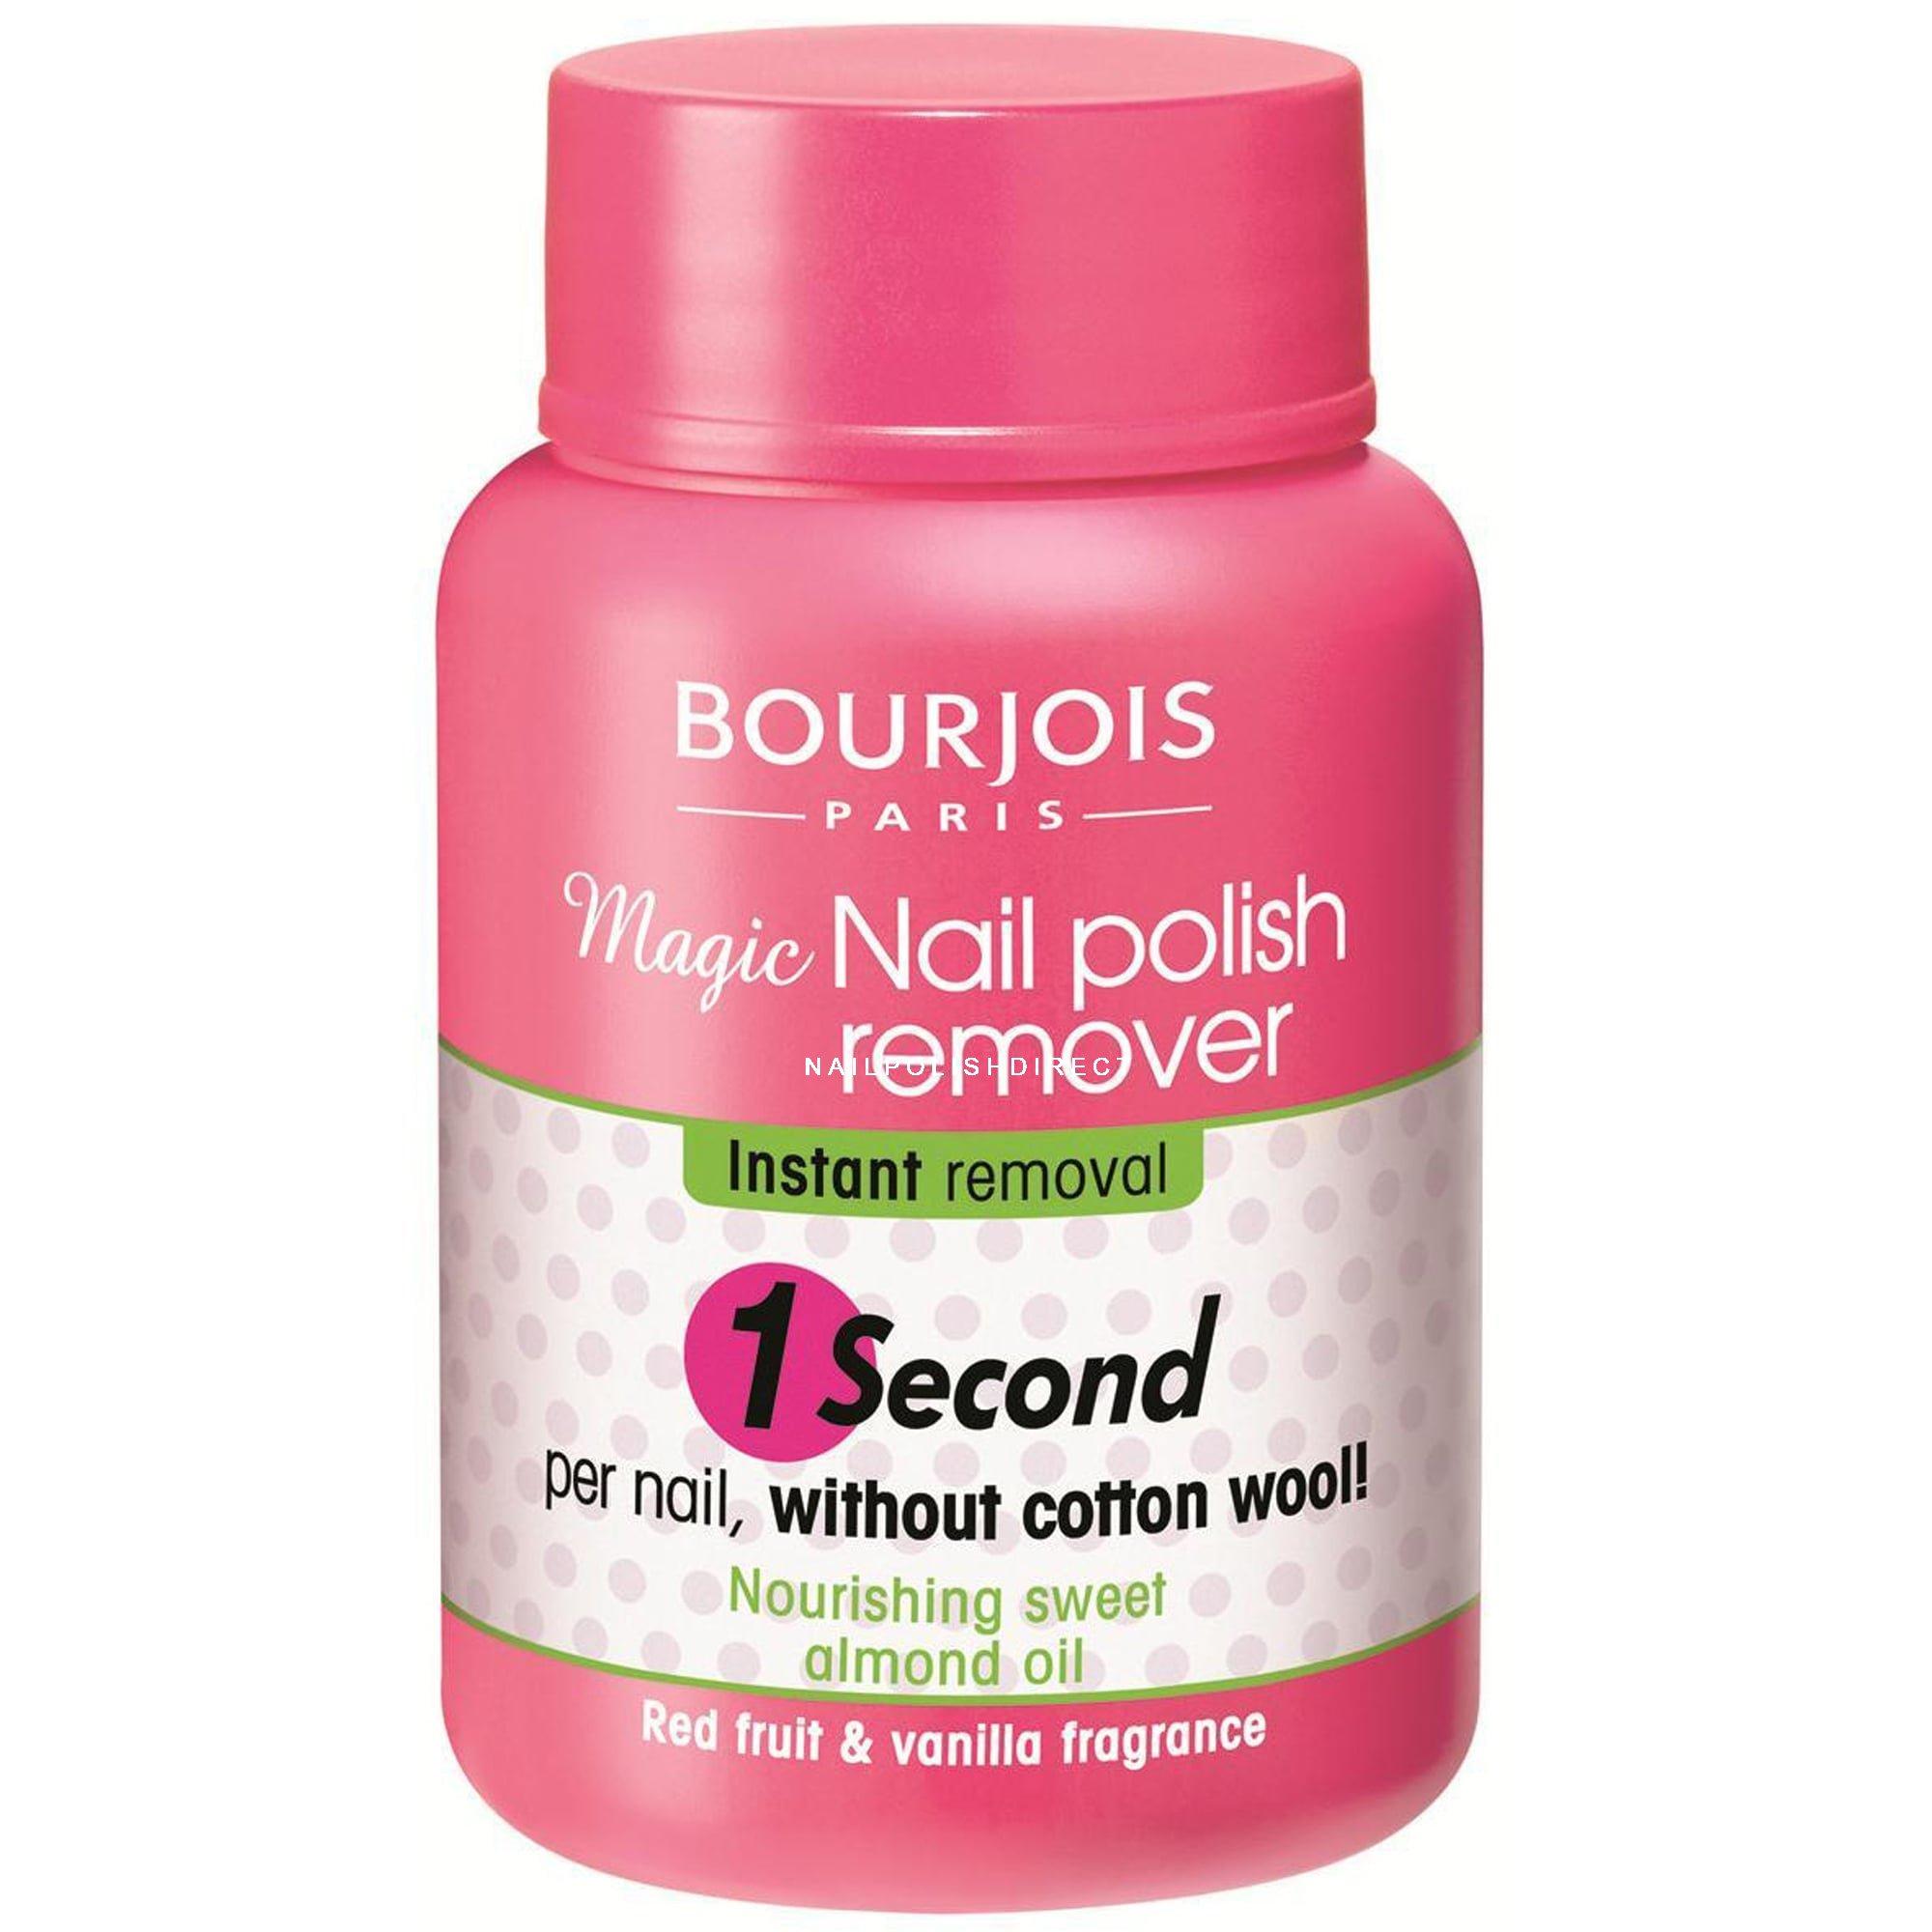 Bourjois Magic 1 Second Polish Remover For Hands Feet Nourishing 75ml